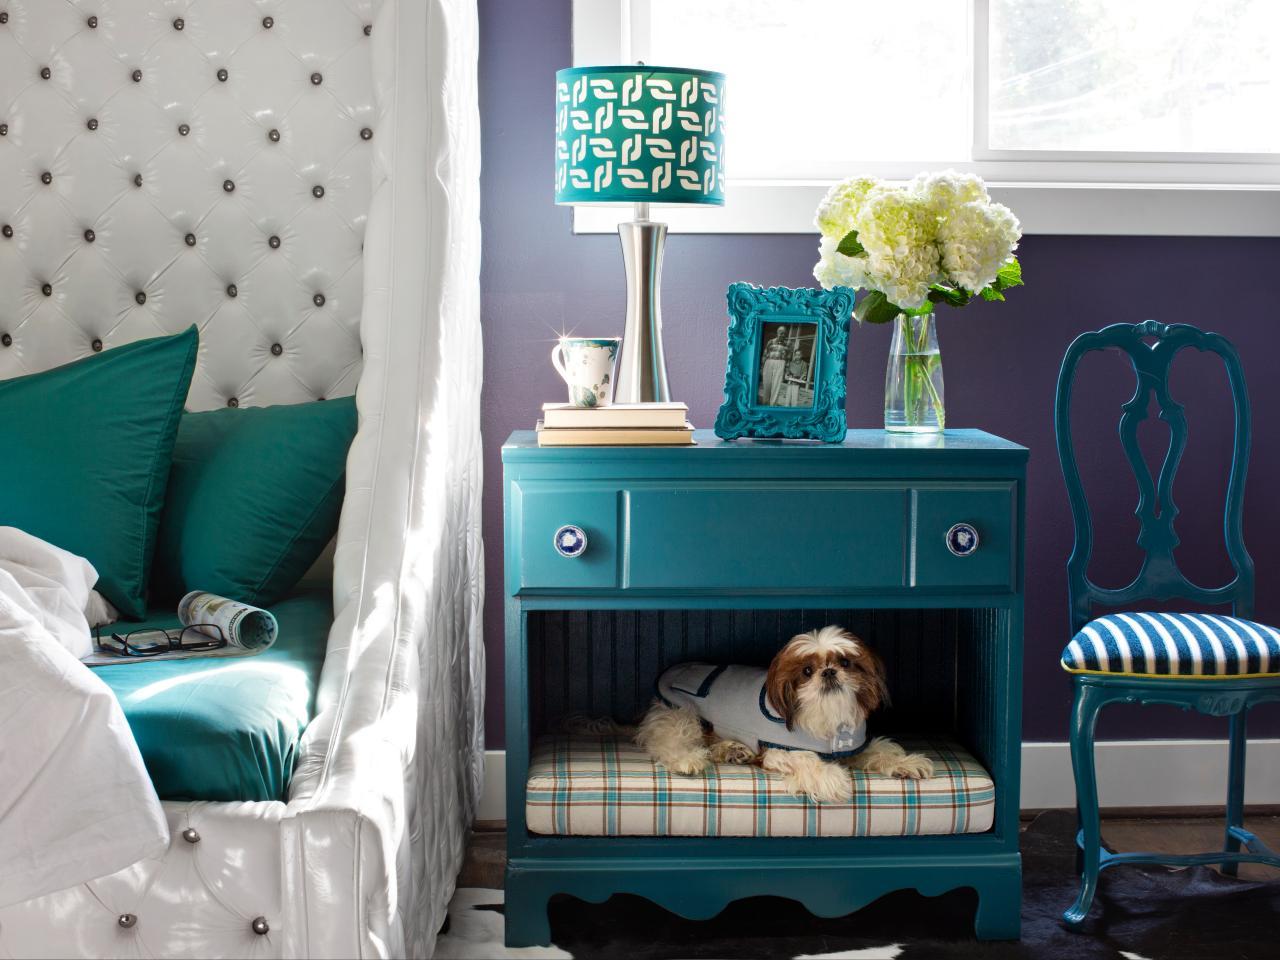 Updated Nightstand With Built-in DIY Pet Bed